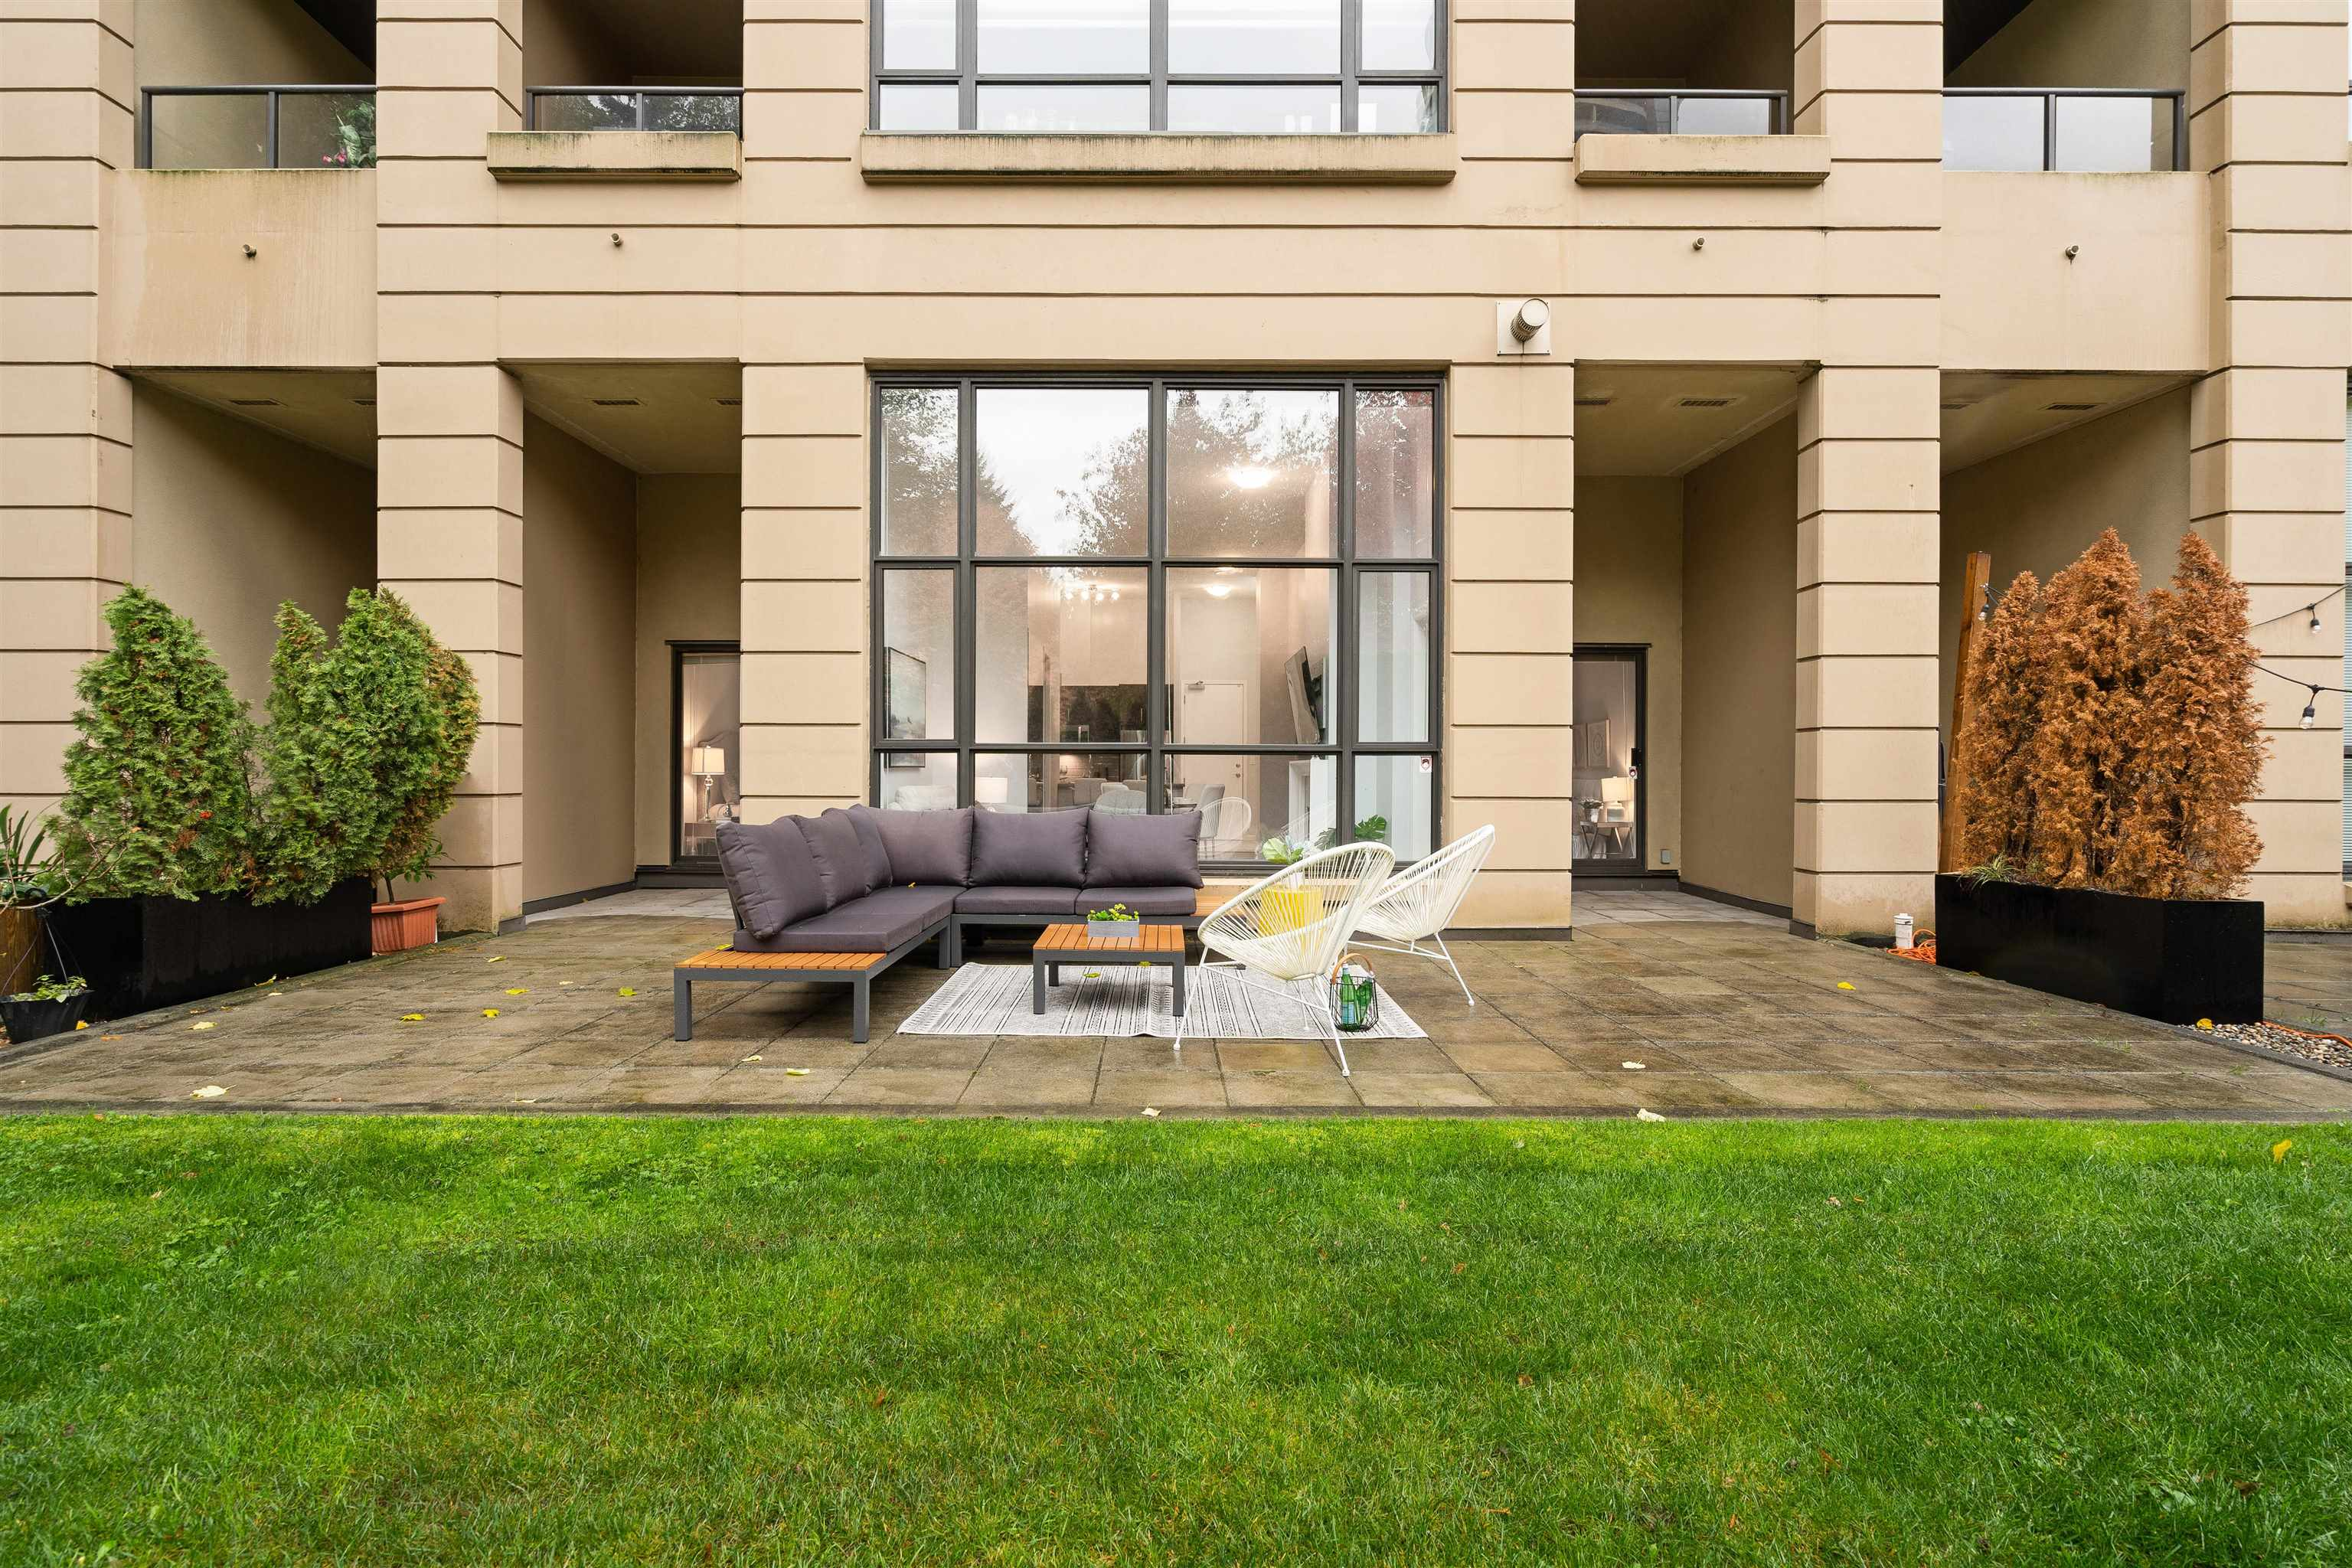 206 7388 SANDBORNE AVENUE - South Slope Apartment/Condo for sale, 2 Bedrooms (R2628590) - #1